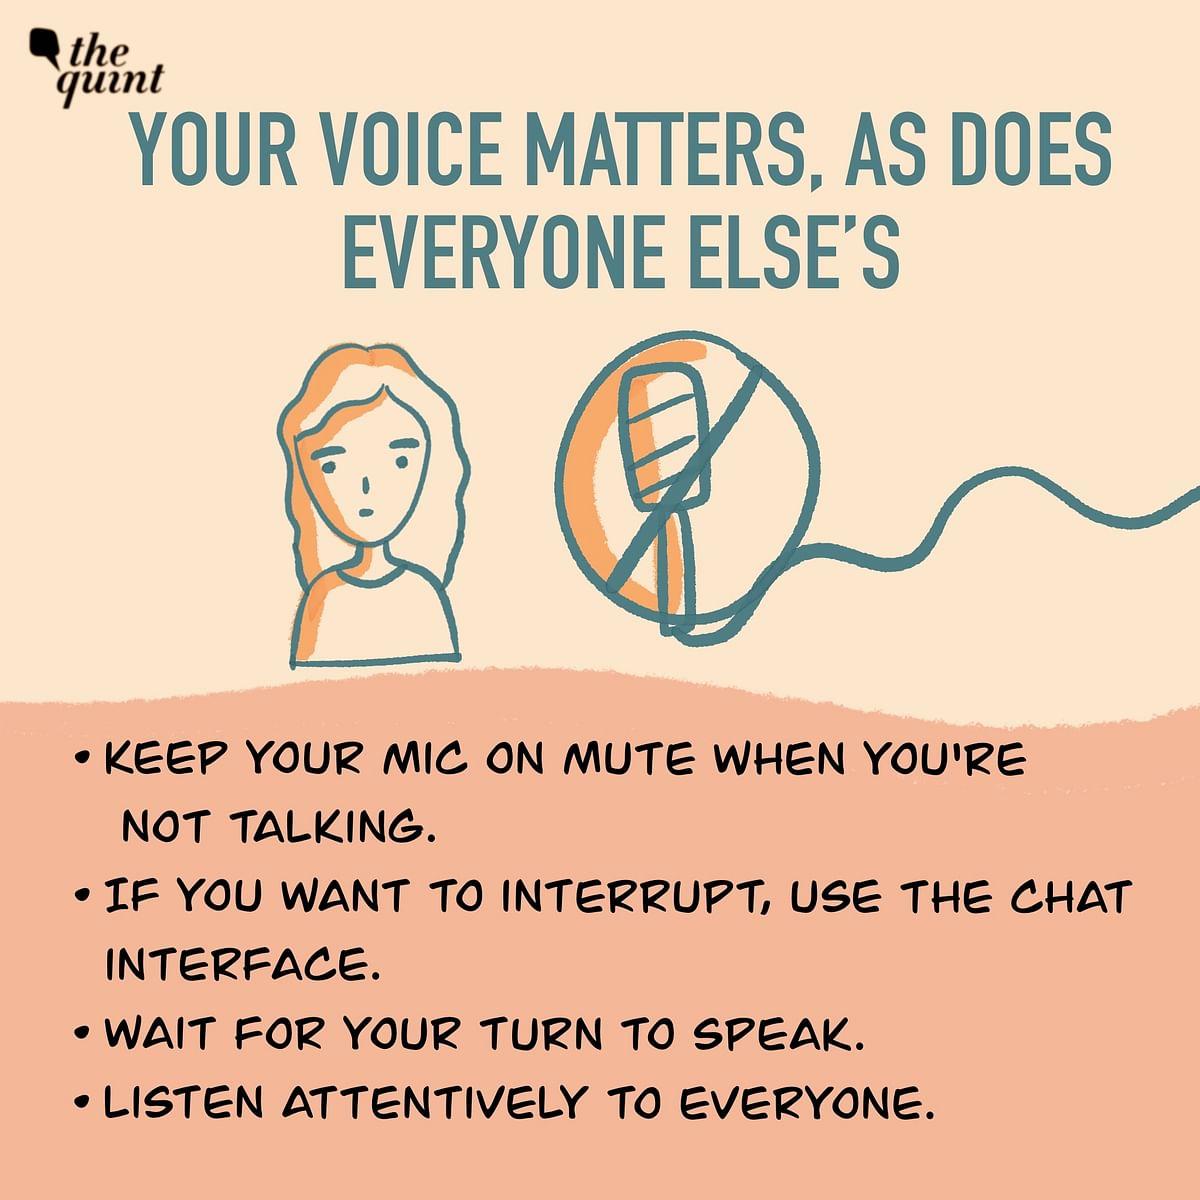 Make sure everyone gets heard.